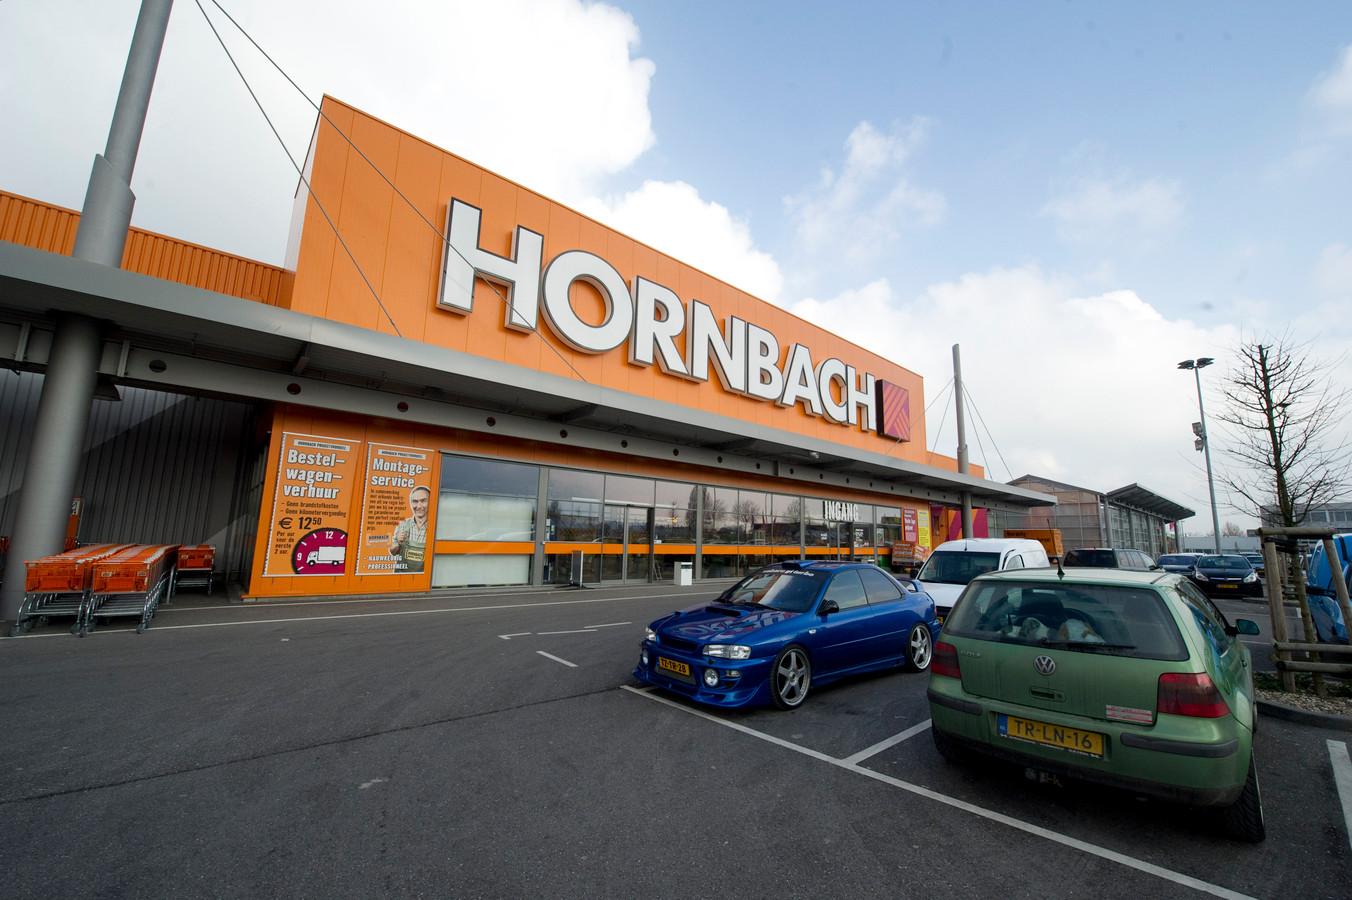 Openingstijden Hornbach Breda.Bouwmarkt Hornbach Bij Ressen Kan Komen Nijmegen